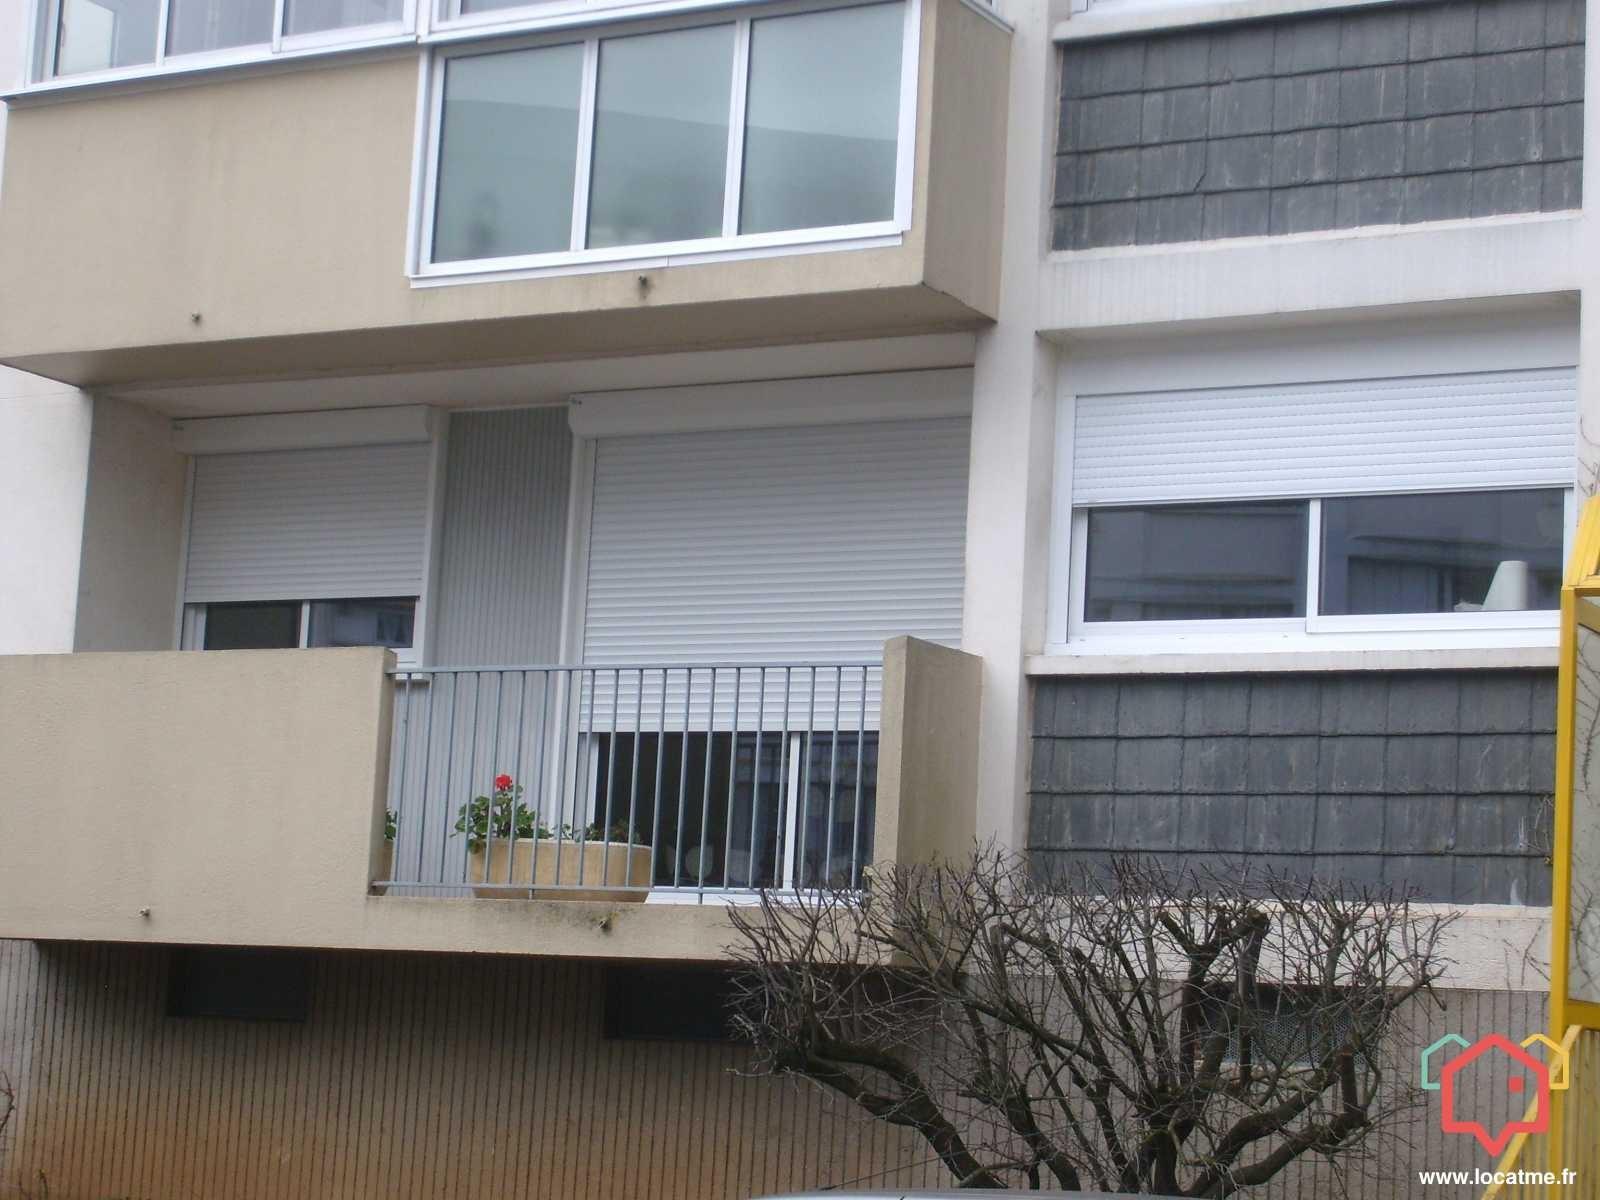 le bon coin 27 location maison ventana blog. Black Bedroom Furniture Sets. Home Design Ideas